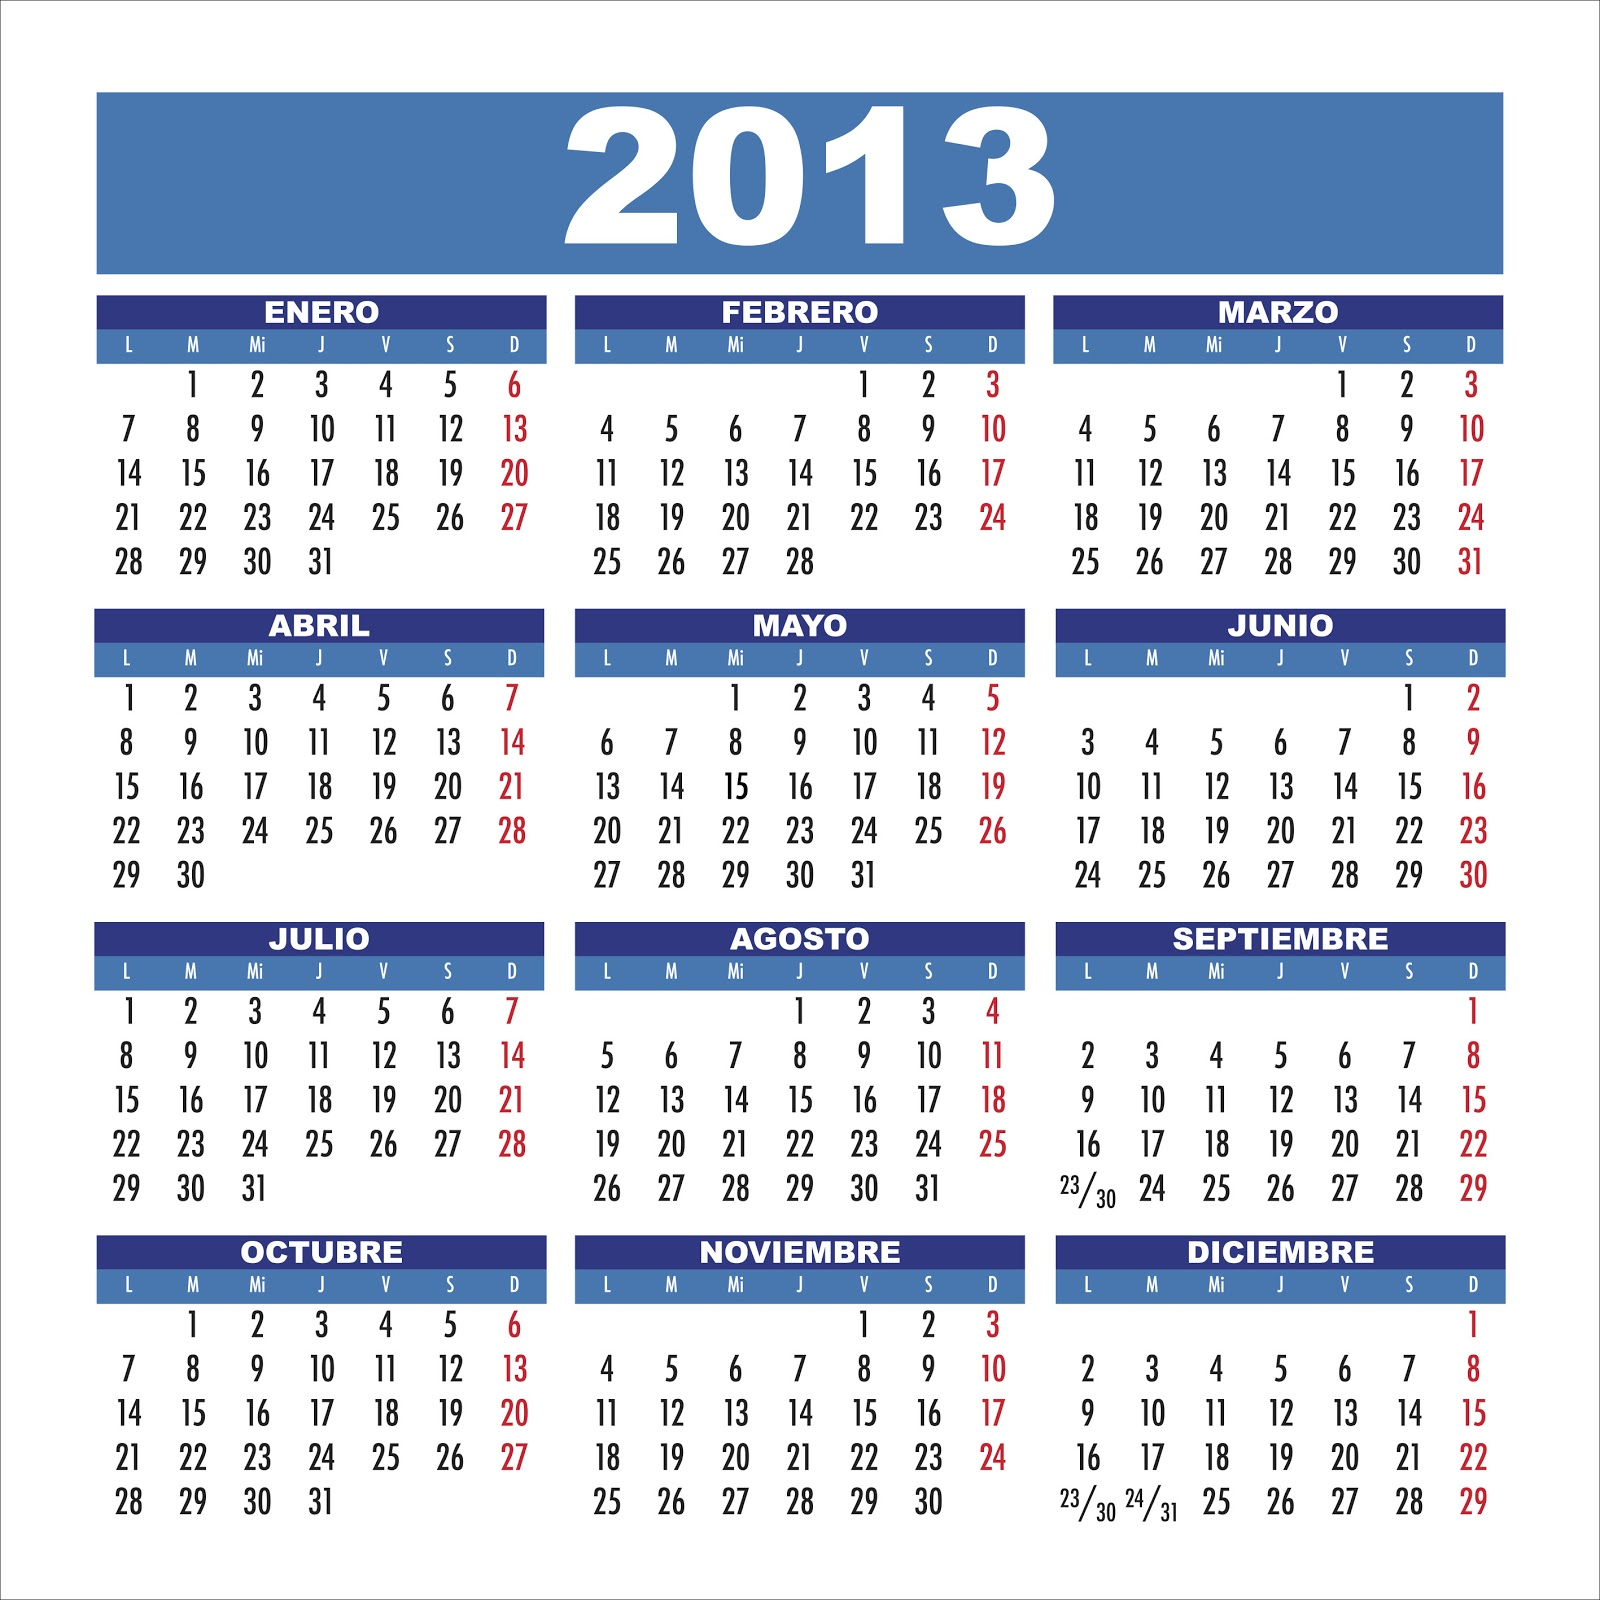 Calendarios+2013+Para+Imprimir+-+Www.10Pixeles.Com+(17).jpg